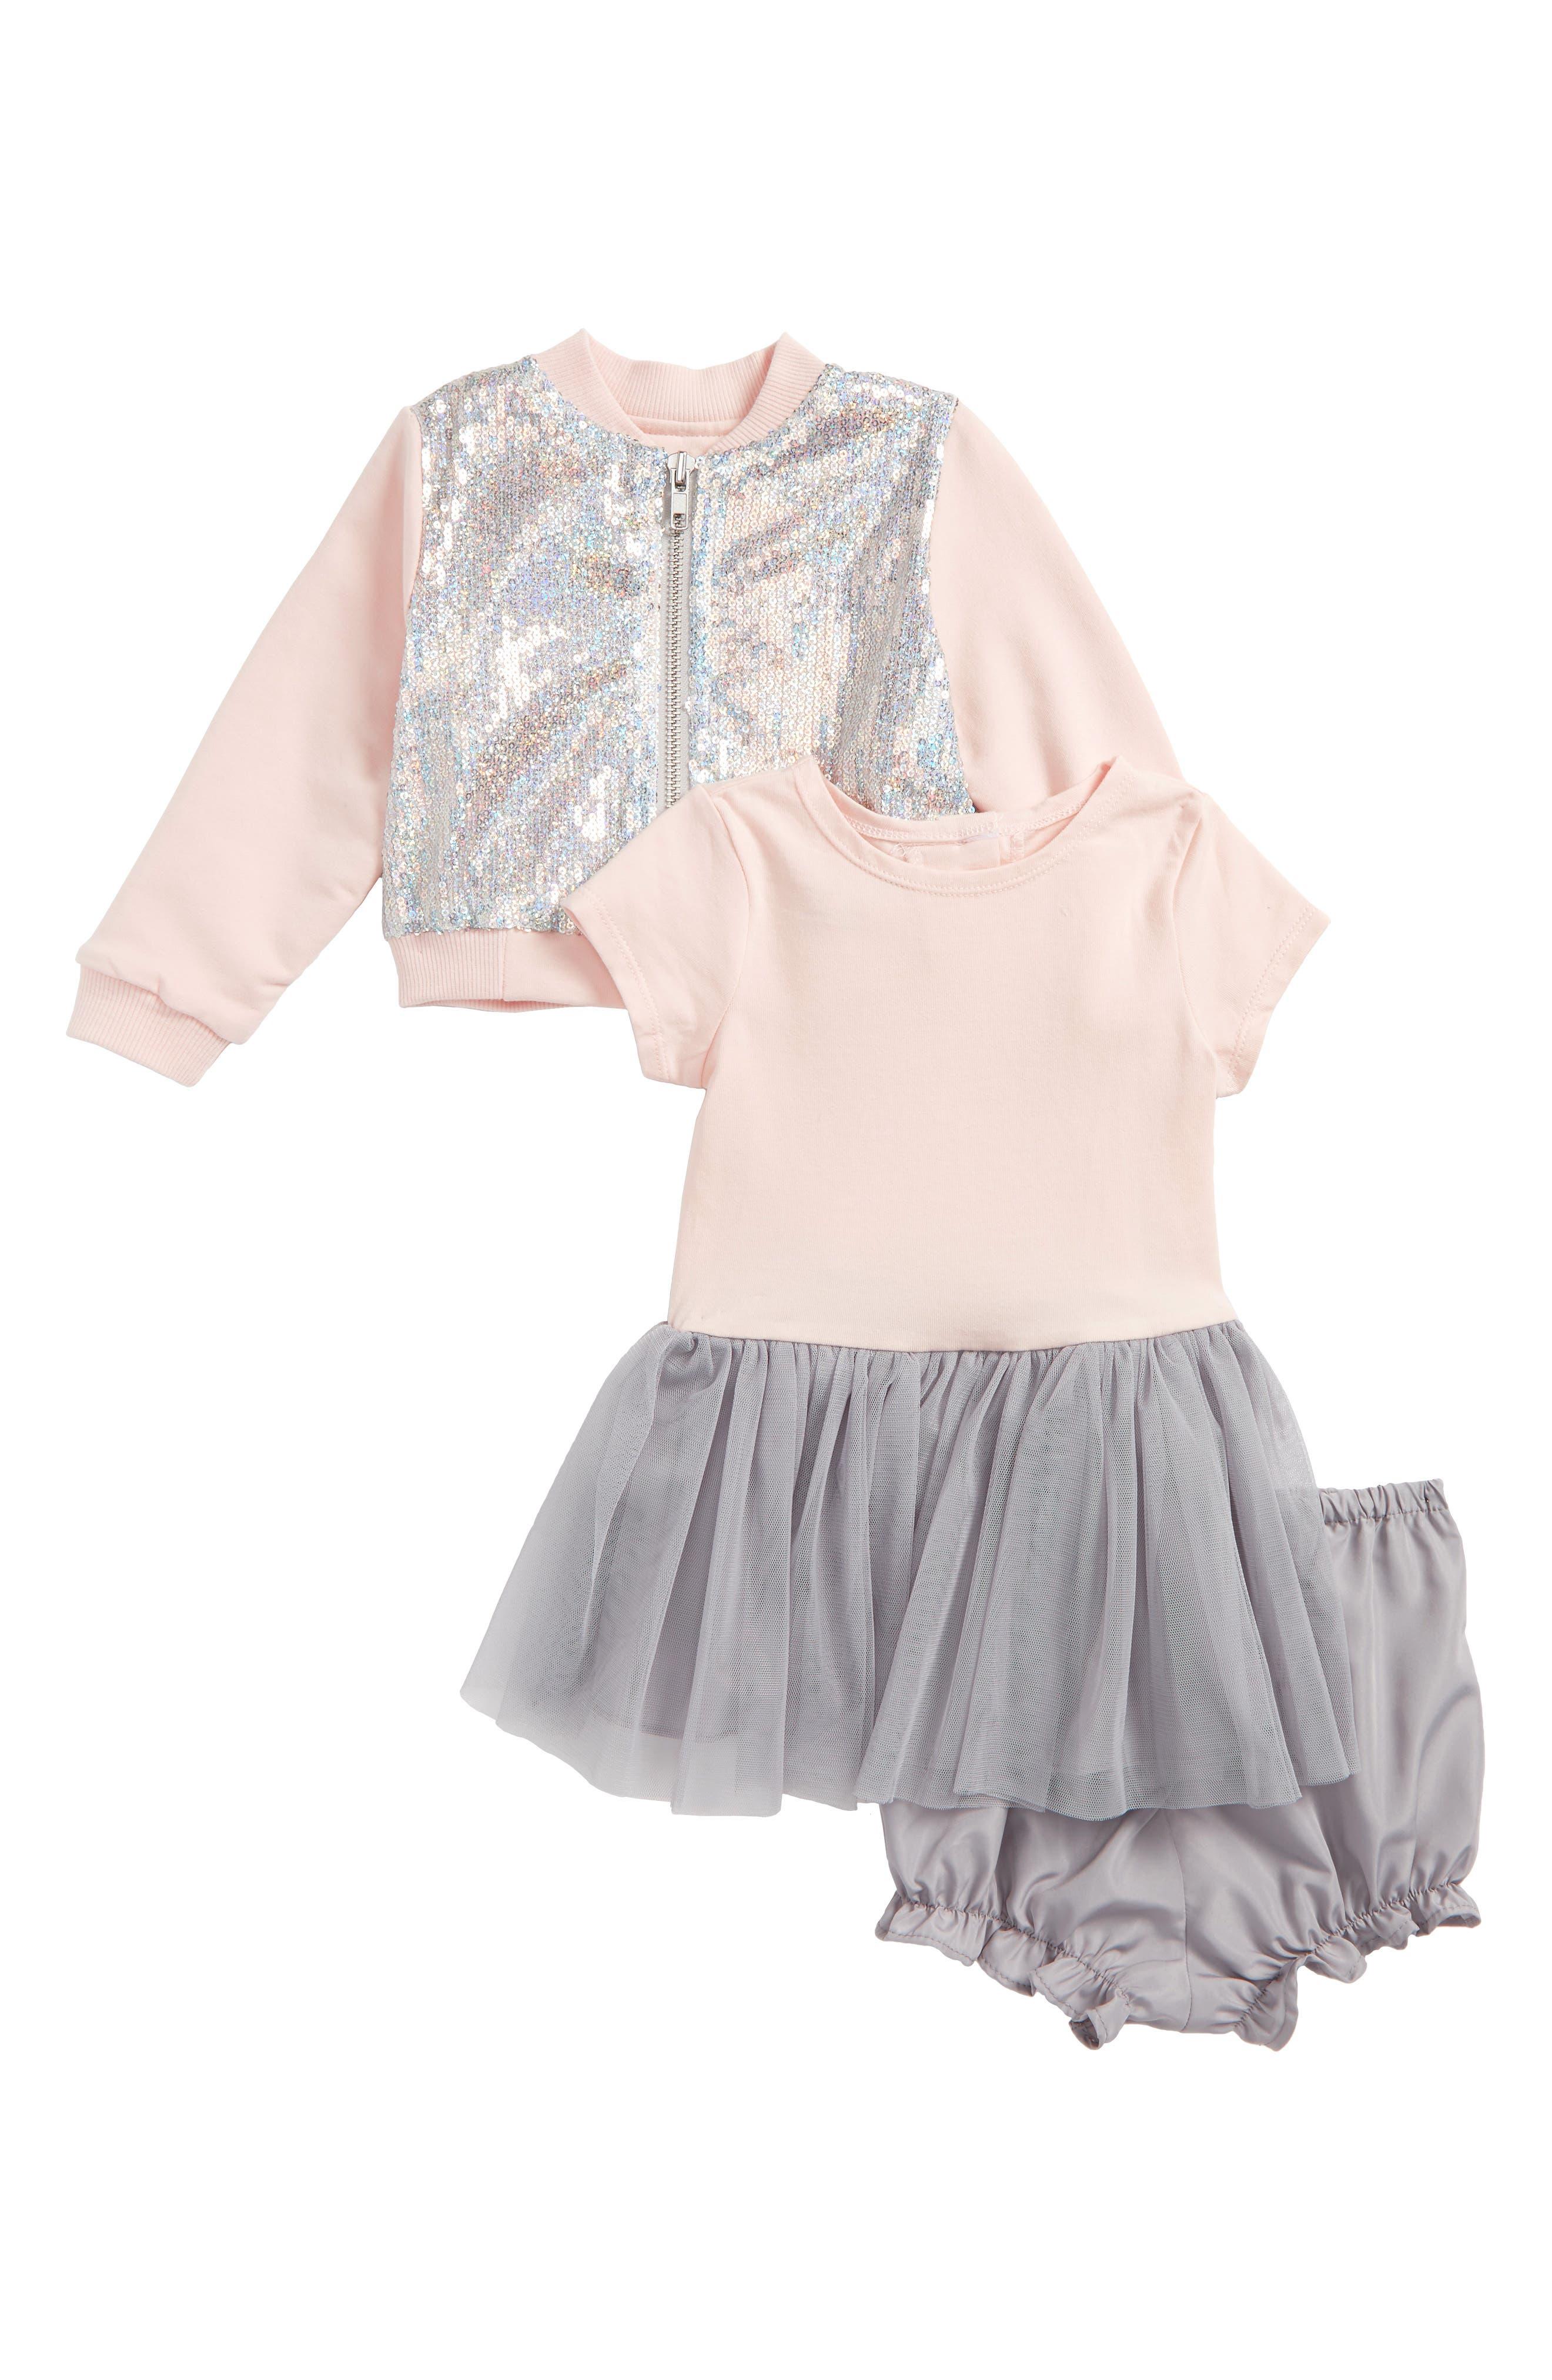 Sequin Bomber Jacket & Tulle Dress Set,                         Main,                         color, Silver/ Pink